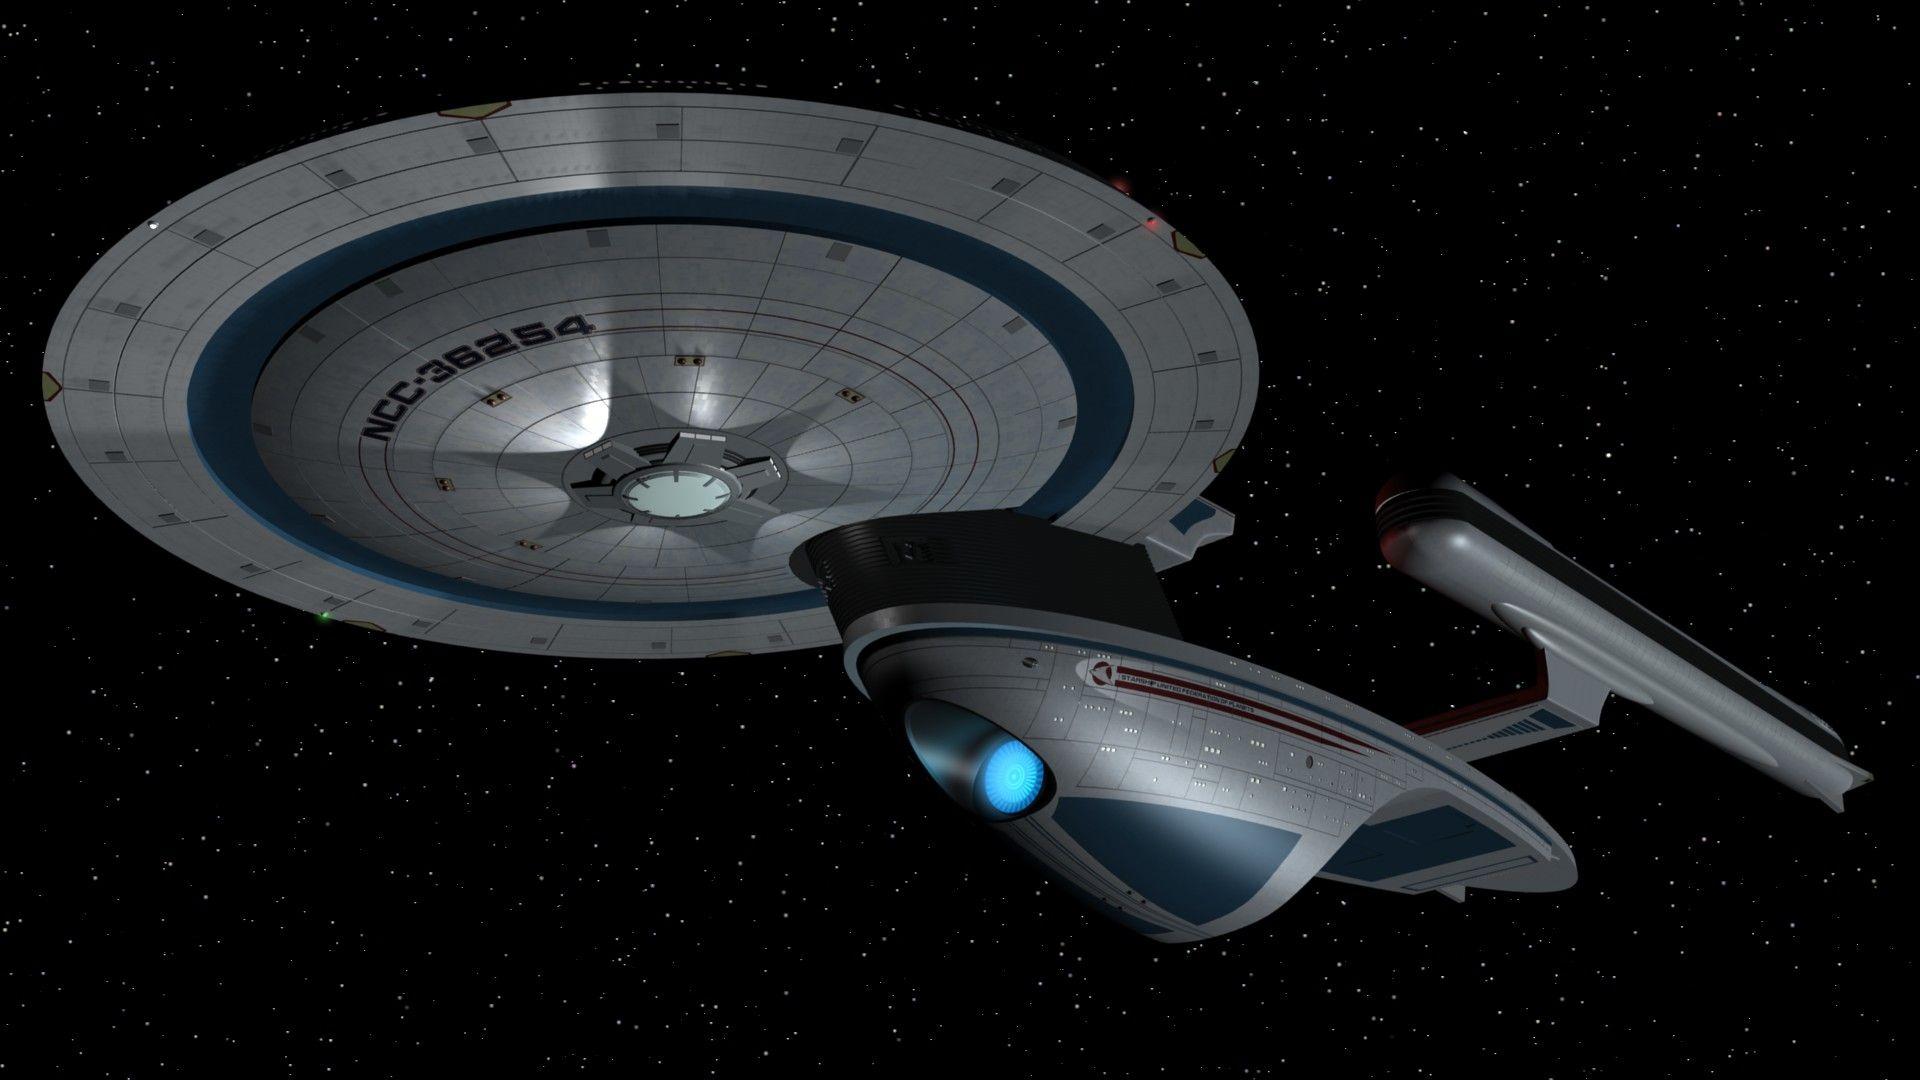 pin federation starfleet class - photo #18